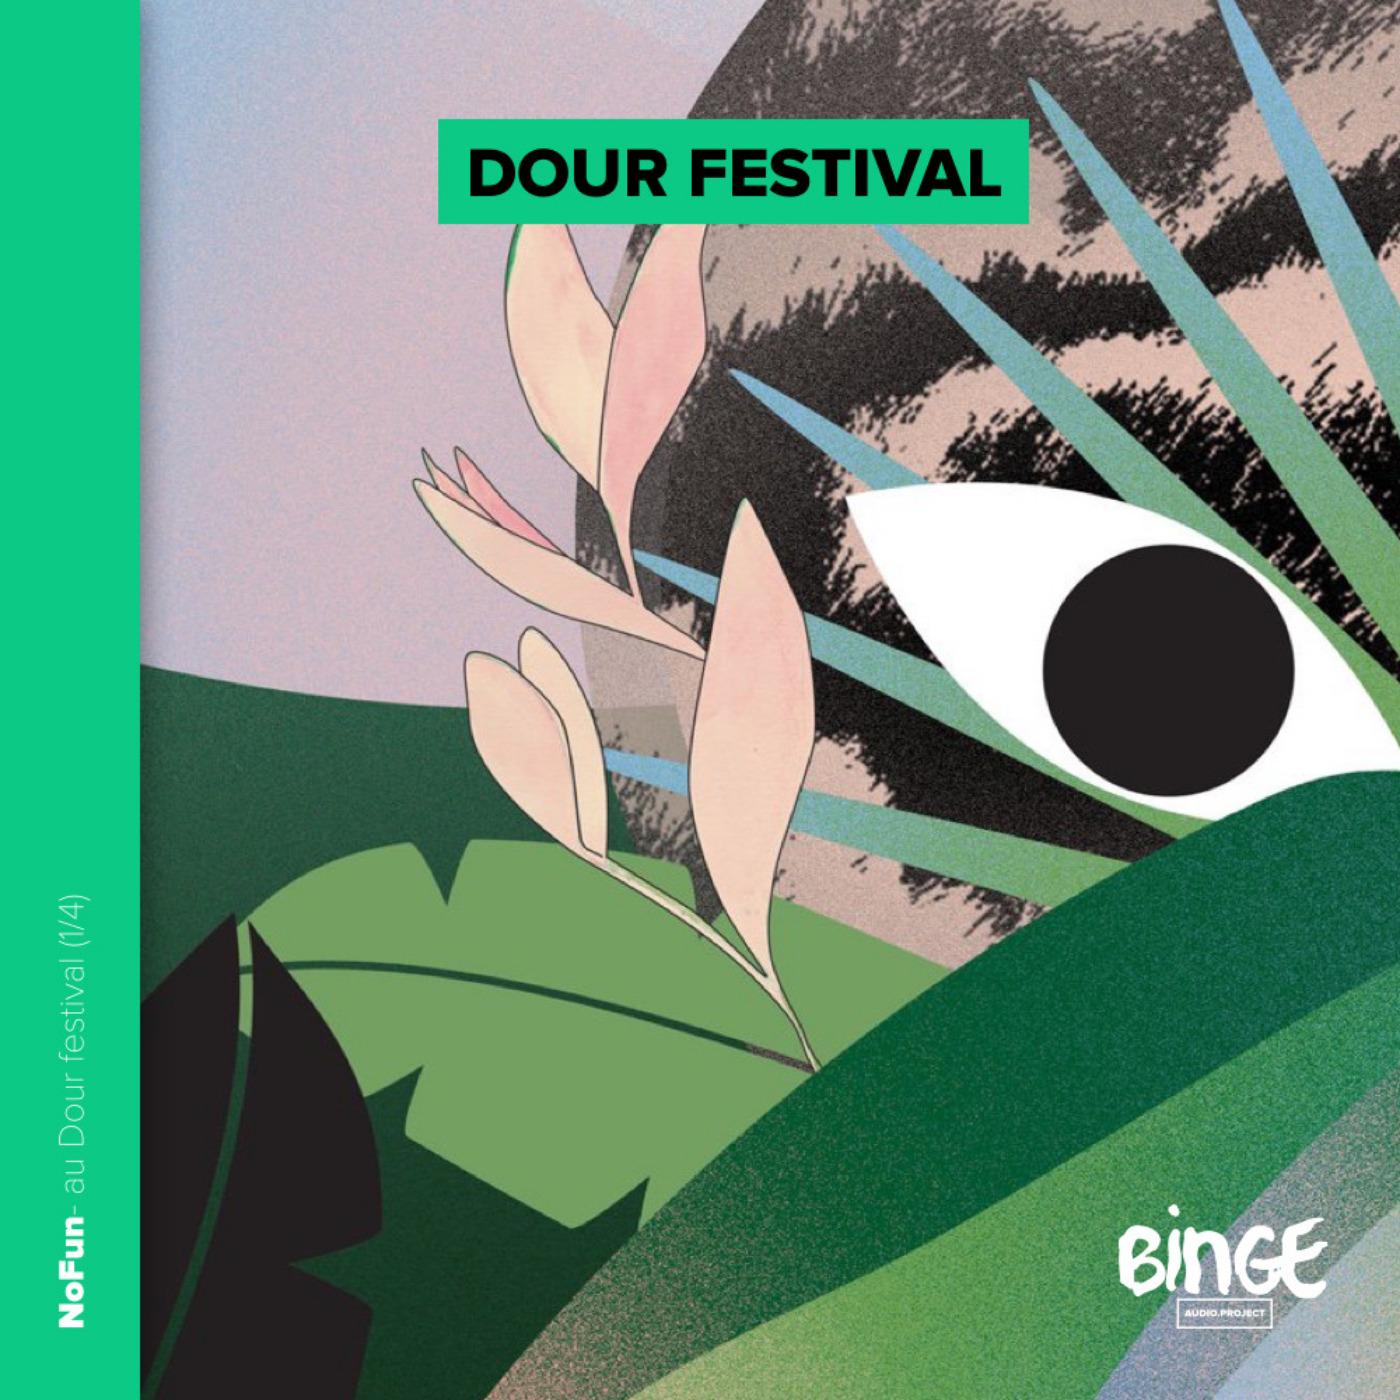 NoFun au Dour festival (1/4)